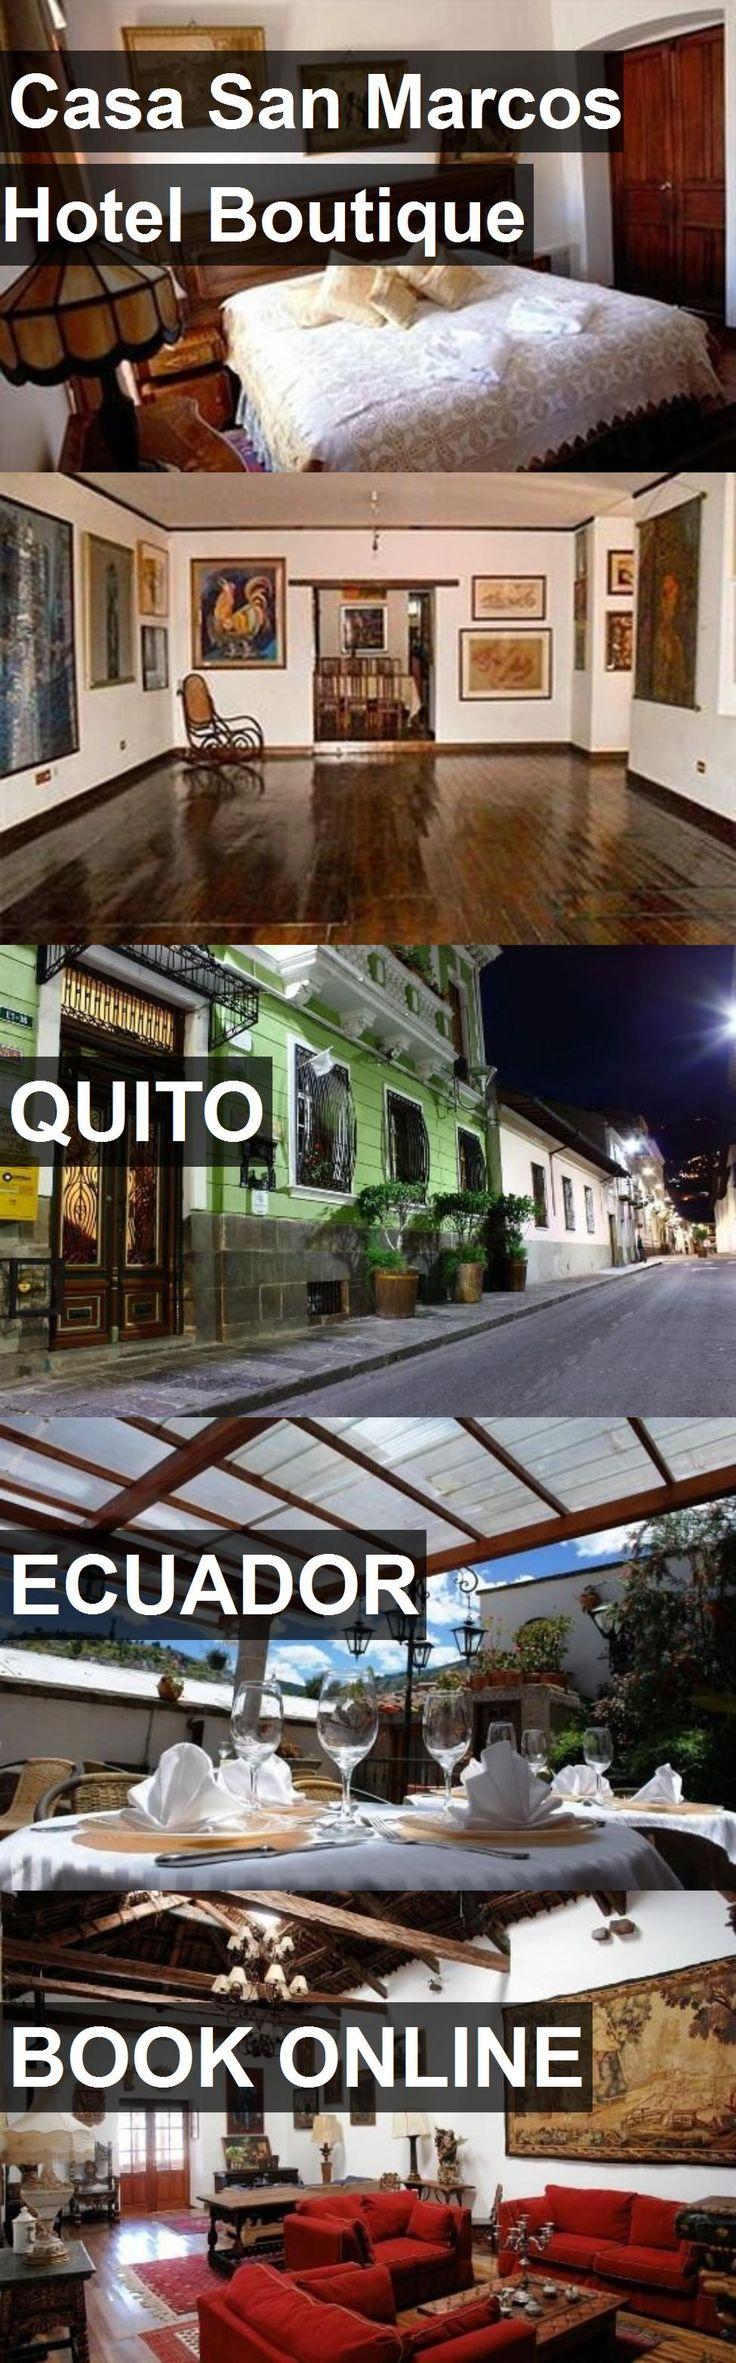 Casa San Marcos Hotel Boutique in Quito, Ecuador. For more information, photos, reviews and best prices please follow the link. #Ecuador #Quito #travel #vacation #hotel